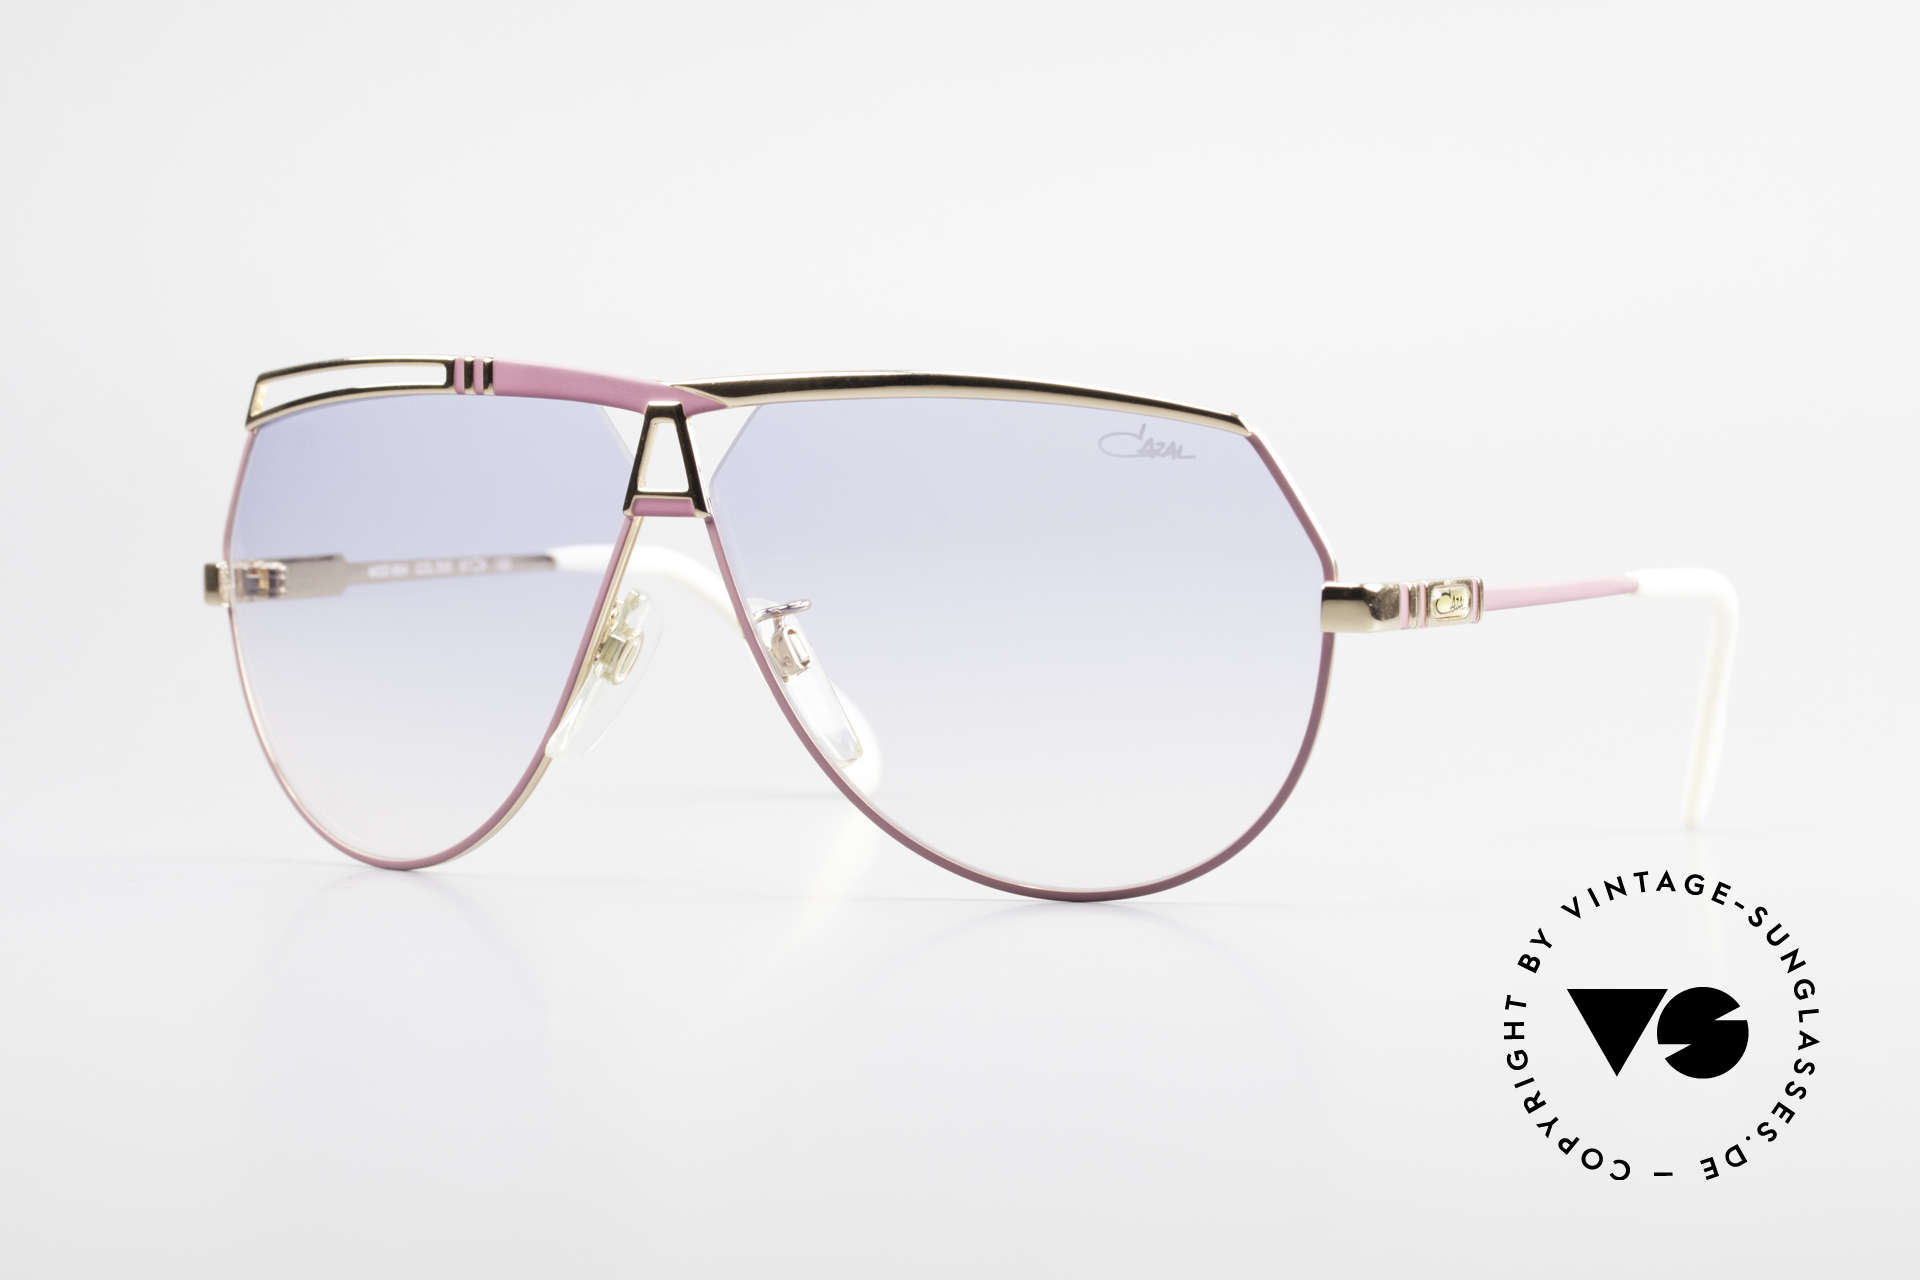 Cazal 954 Oversized 80's Sunglasses, extraordinary vintage Cazal designer sunglasses, Made for Women